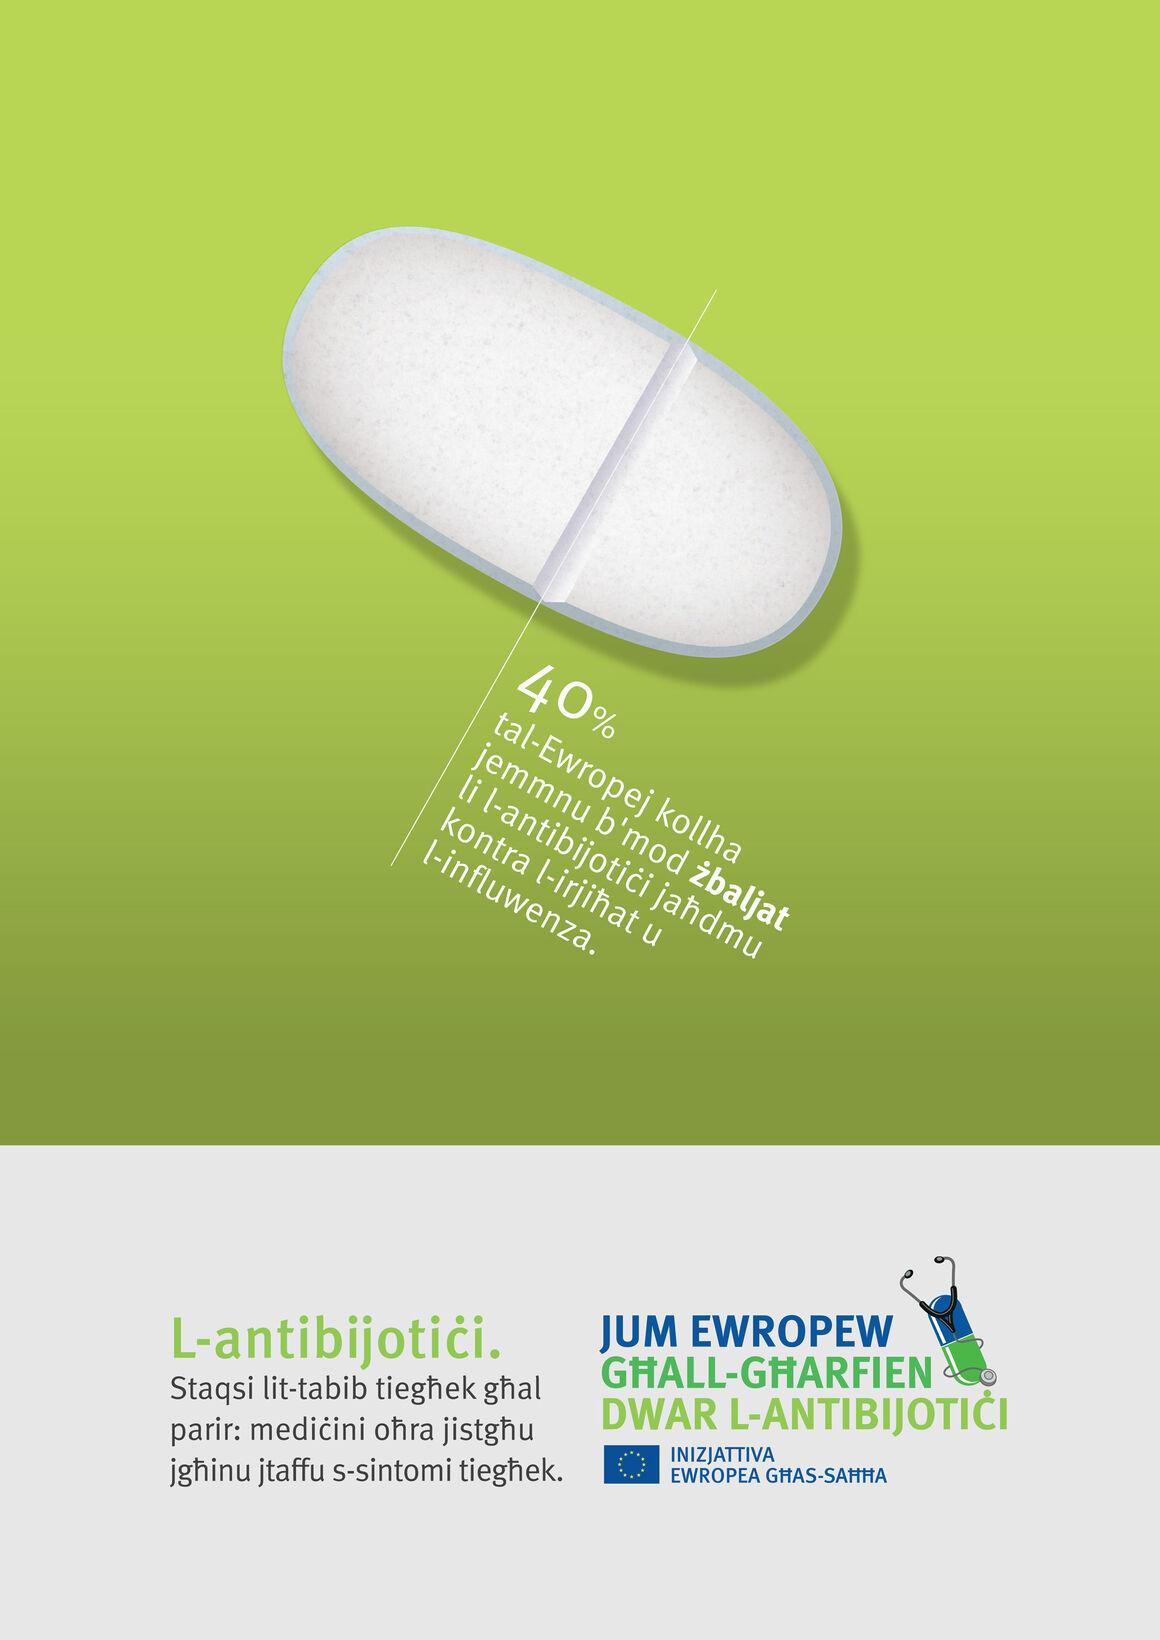 antibiotics-self-medication-pills-poster-general-public